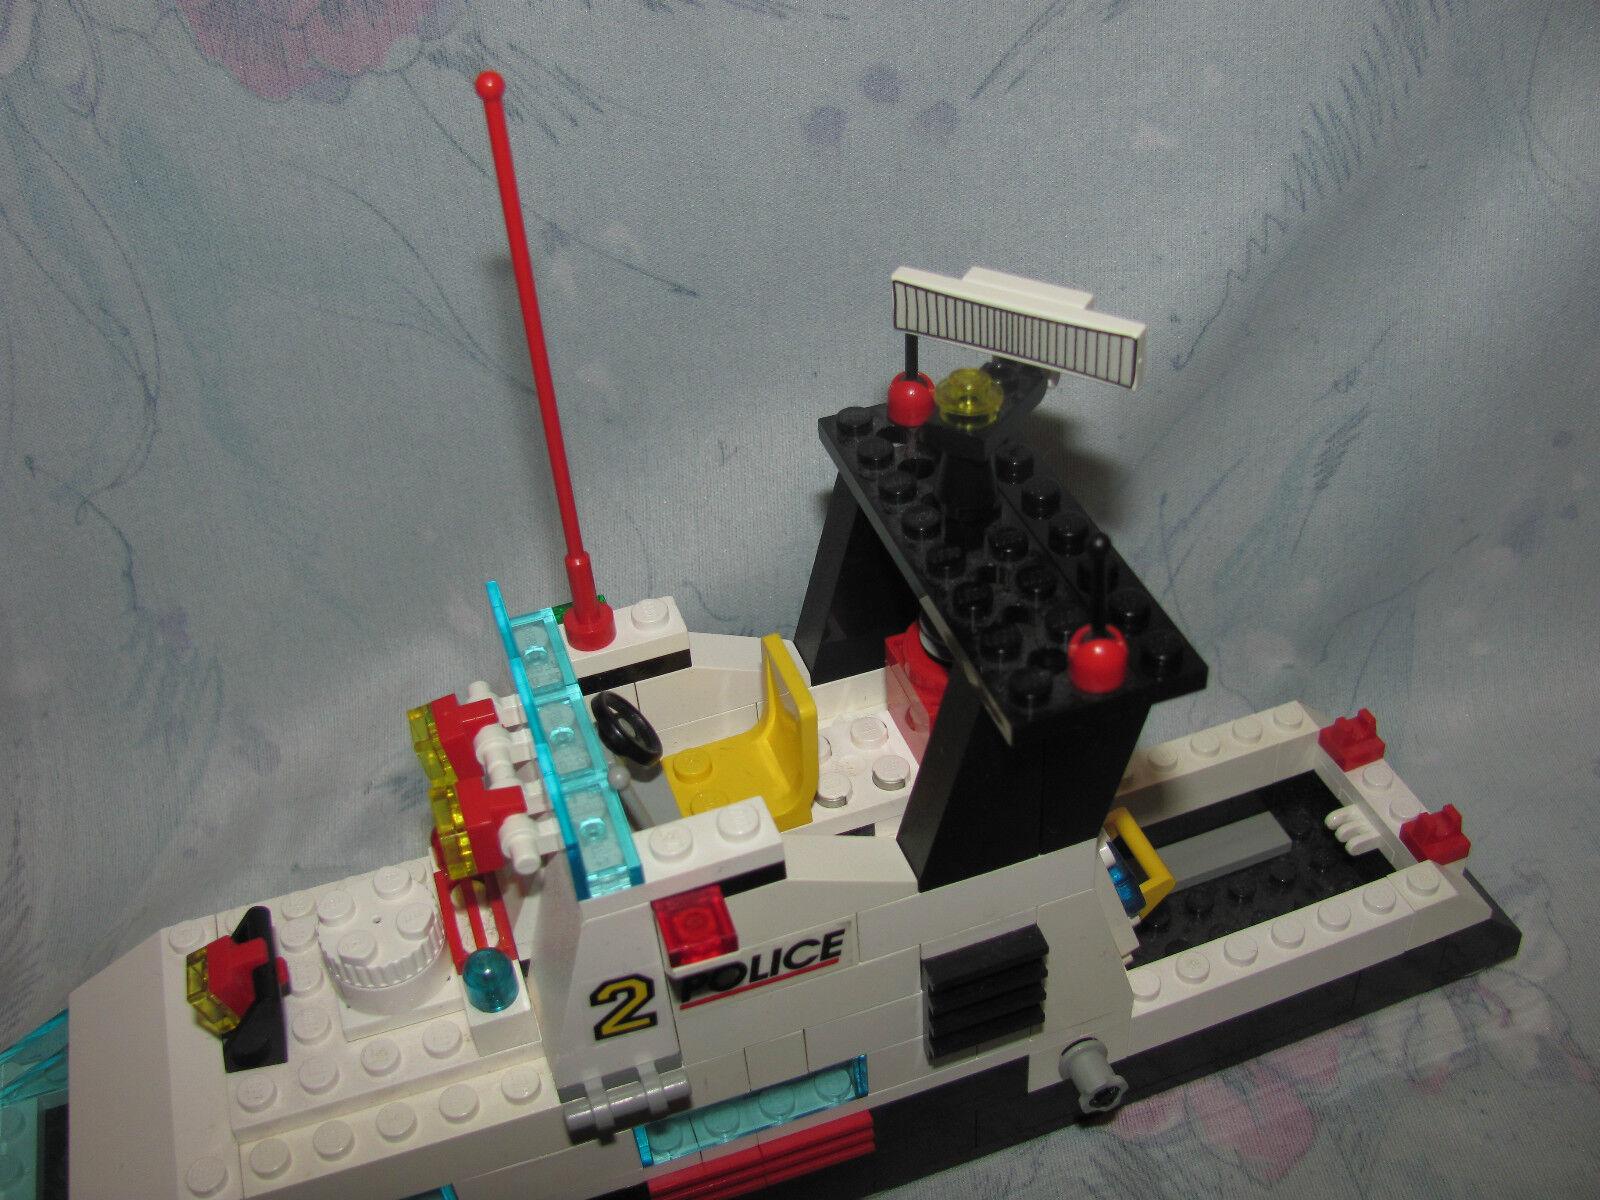 Lego 6483 6483 6483 Coastal Patrol Boats - All Figures - Not Complete - 1994 Boat Set 31e581